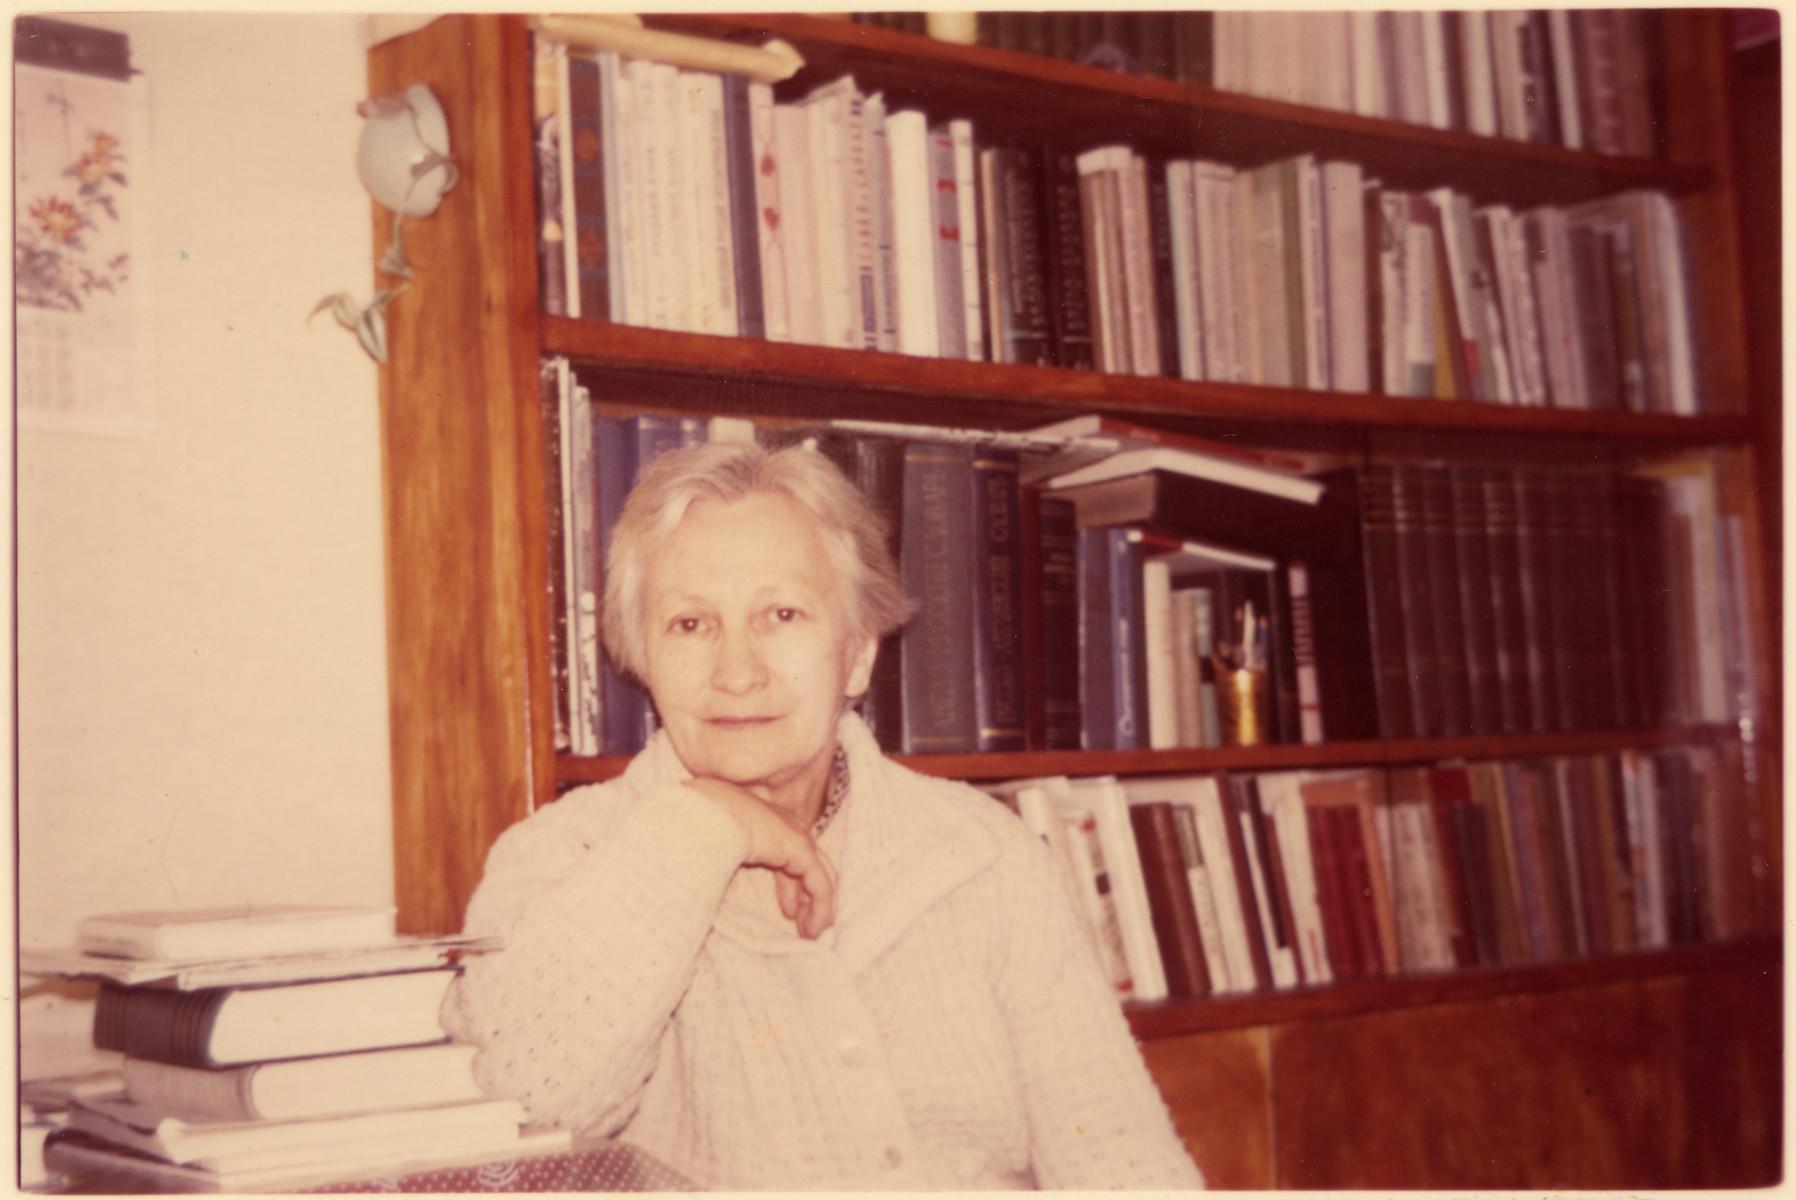 Postwar photograph of Lithuanian rescuer, Natalia Pavlovna Egorova.